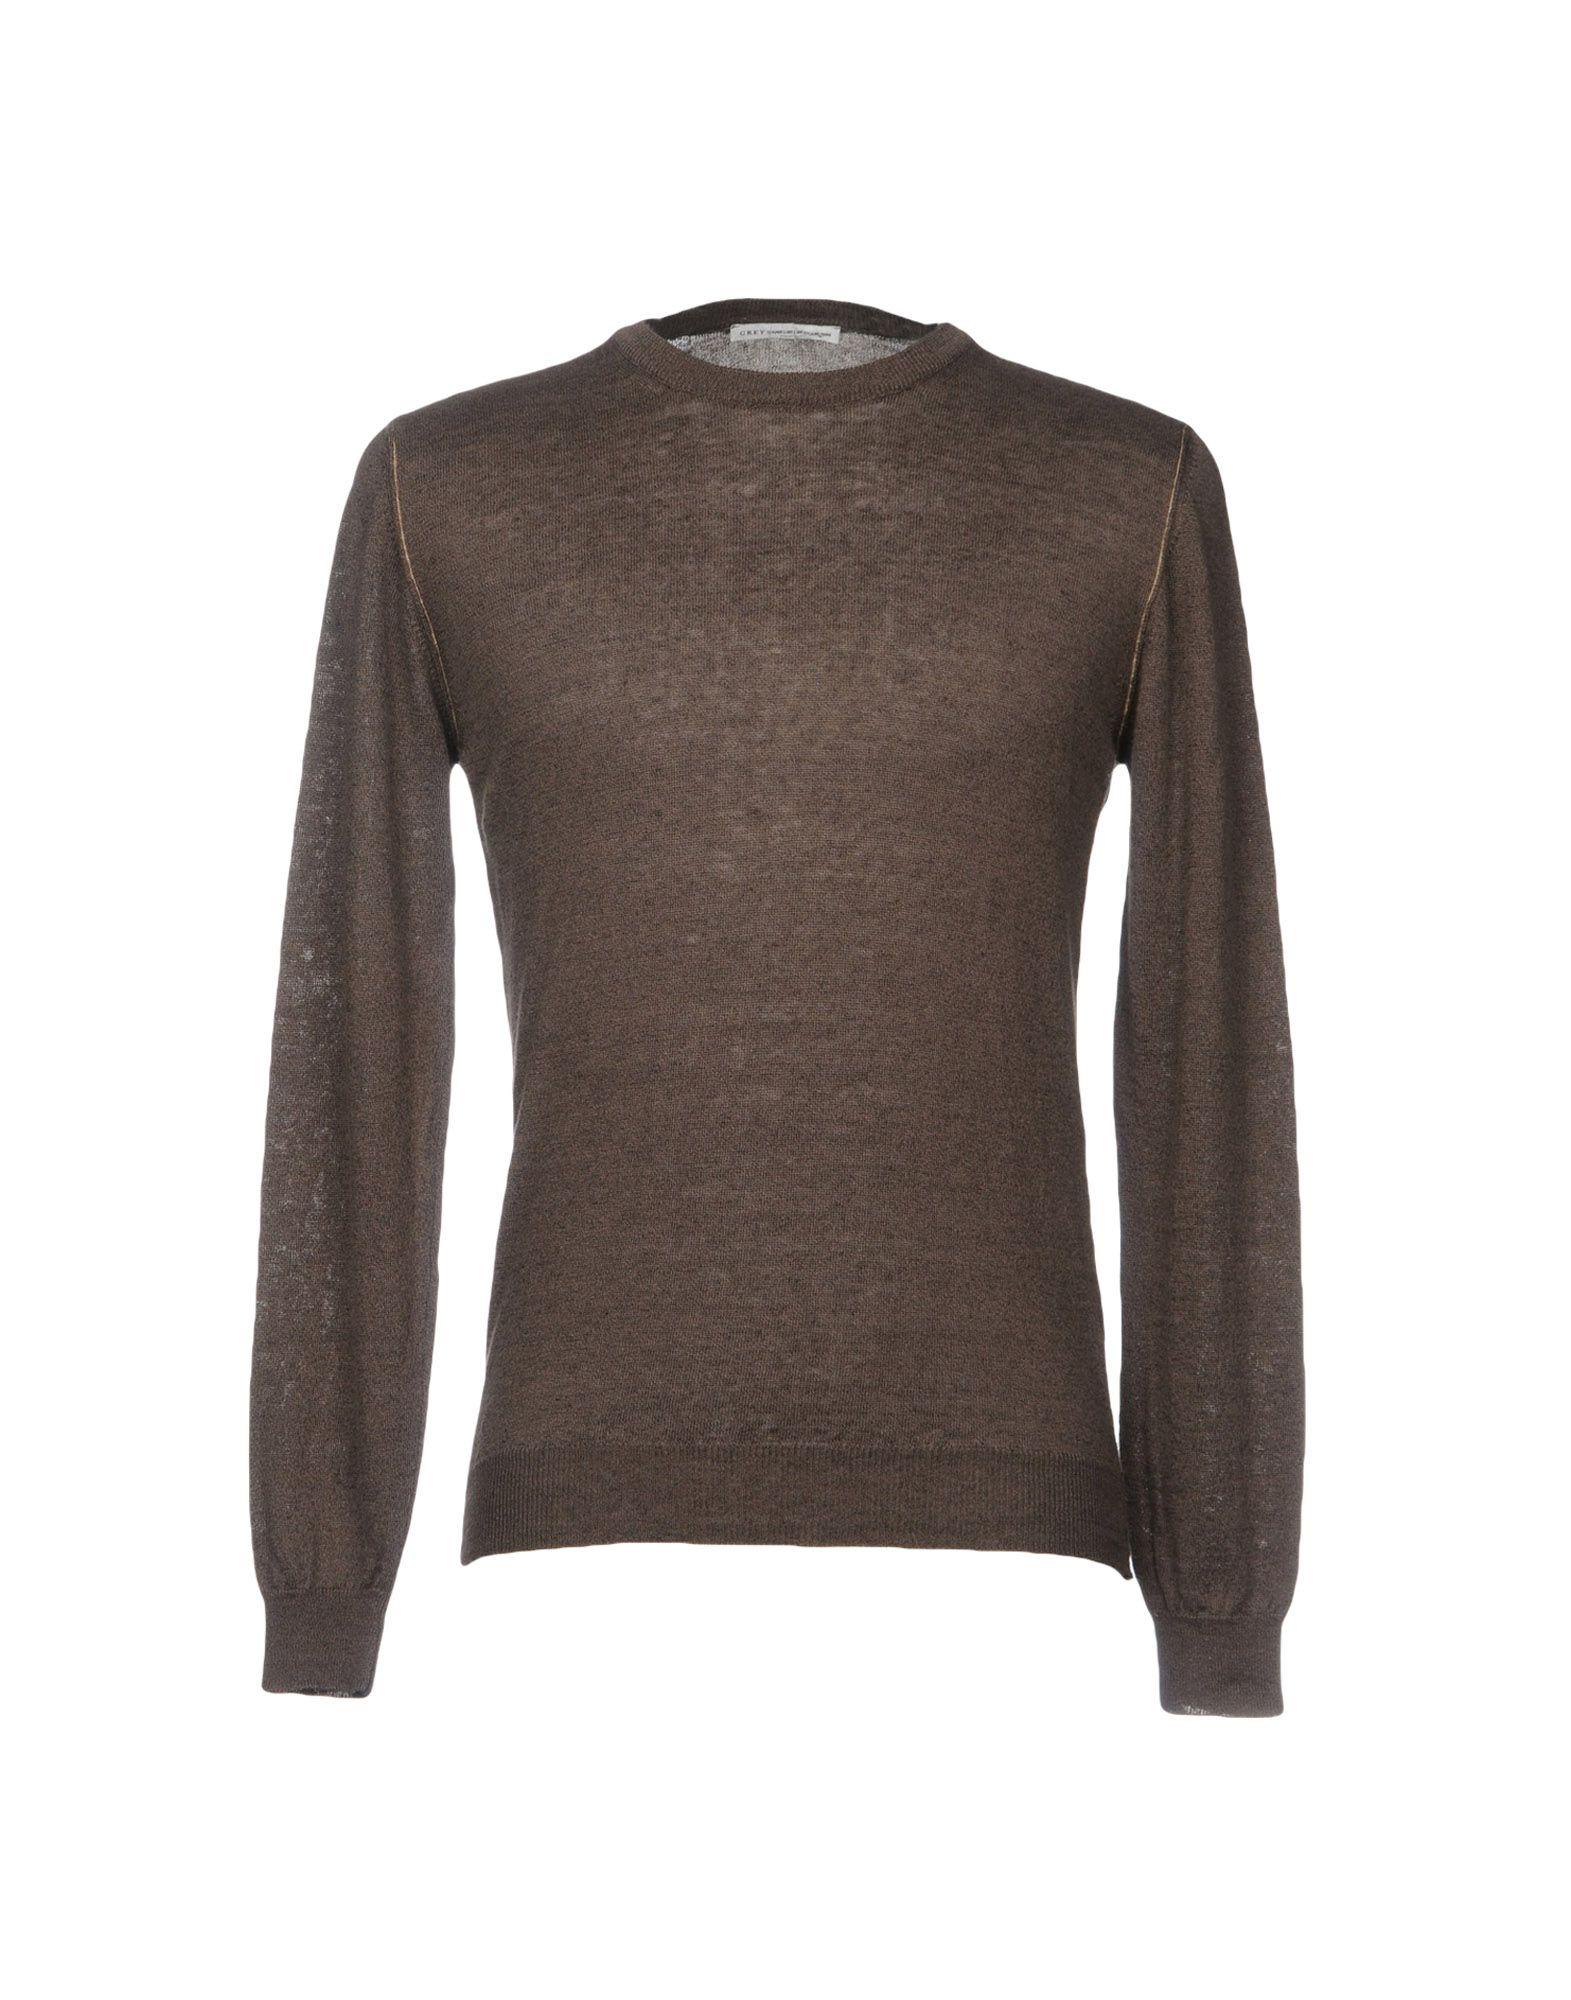 GREY DANIELE ALESSANDRINI Свитер betsy adam new lt grey sequin bottom blouson dress 8 msrp $179 00